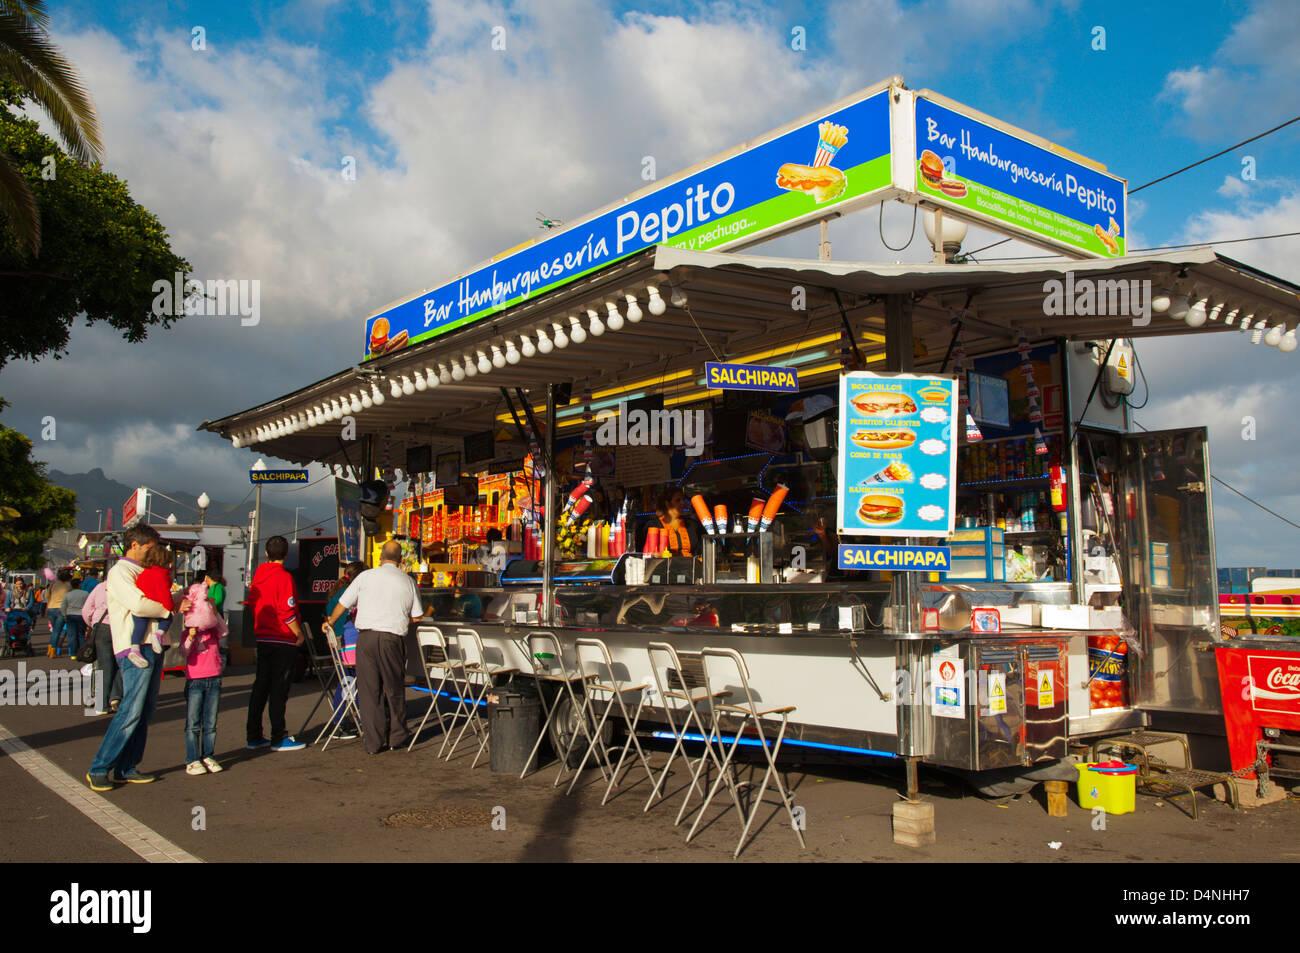 Fast-Food Kiosk am Jahrmarkt während Karneval Santa Cruz Stadt Teneriffa Insel Kanaren Spanien Stockbild